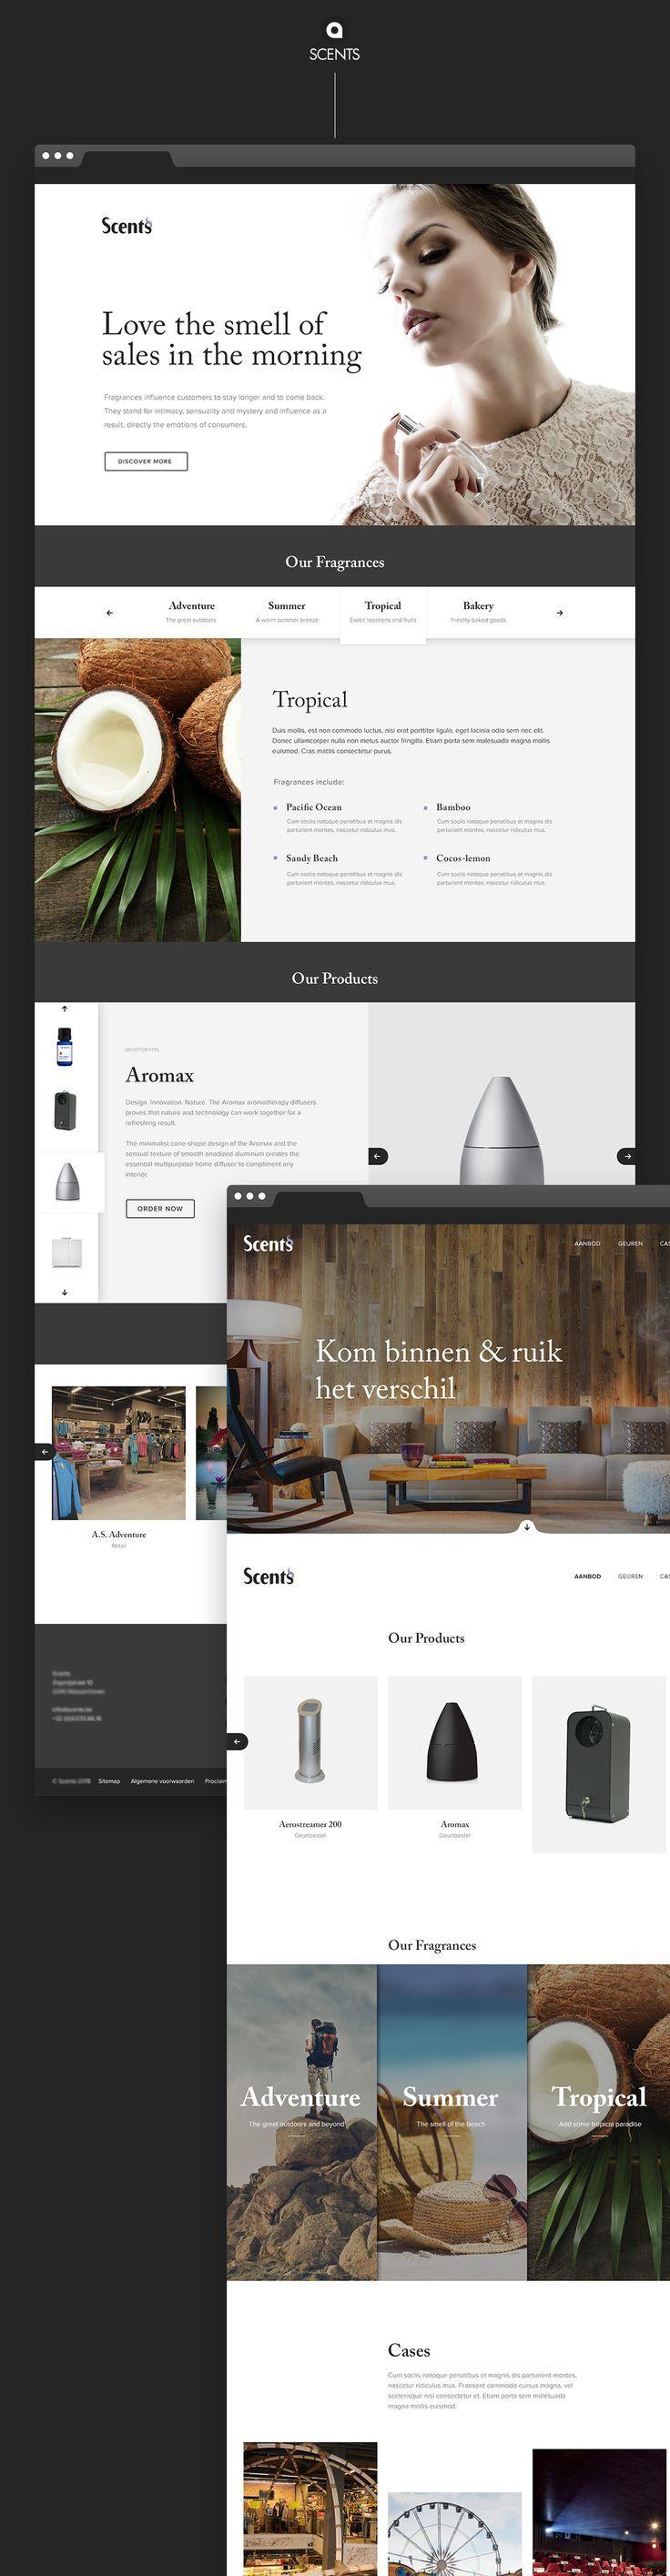 Web design inspiration | #1218